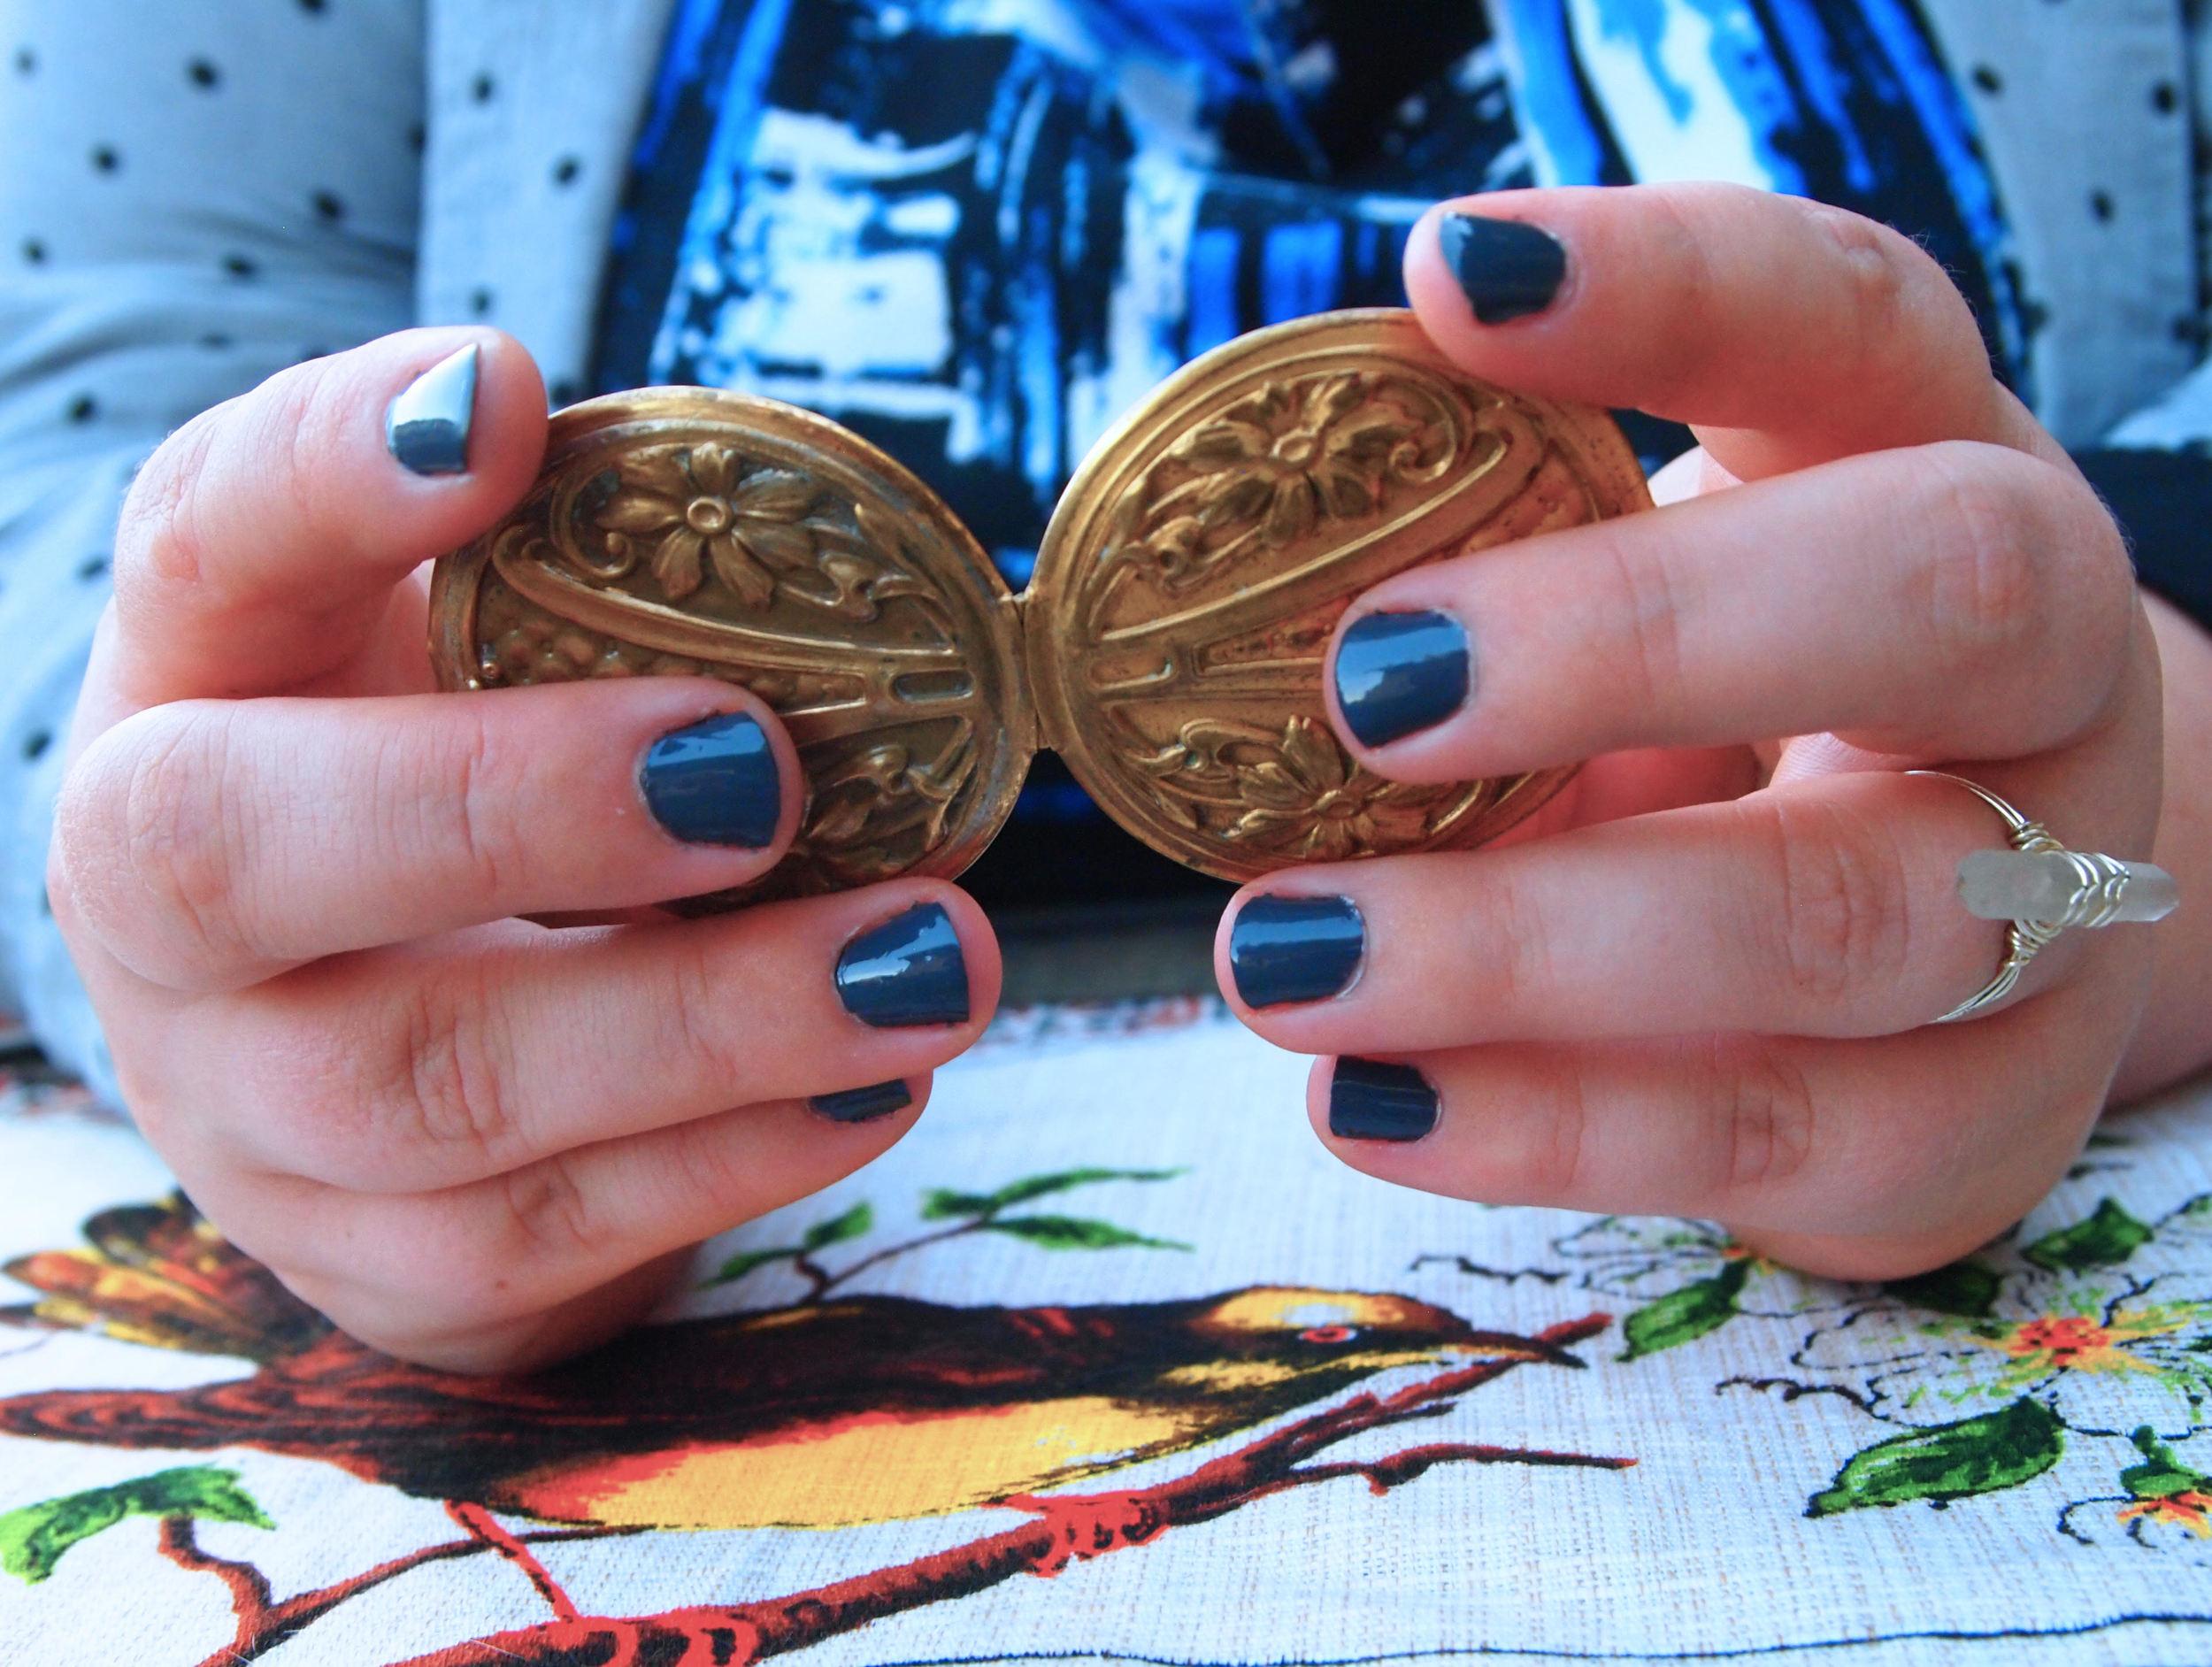 Tina's hands holding an antique locket.